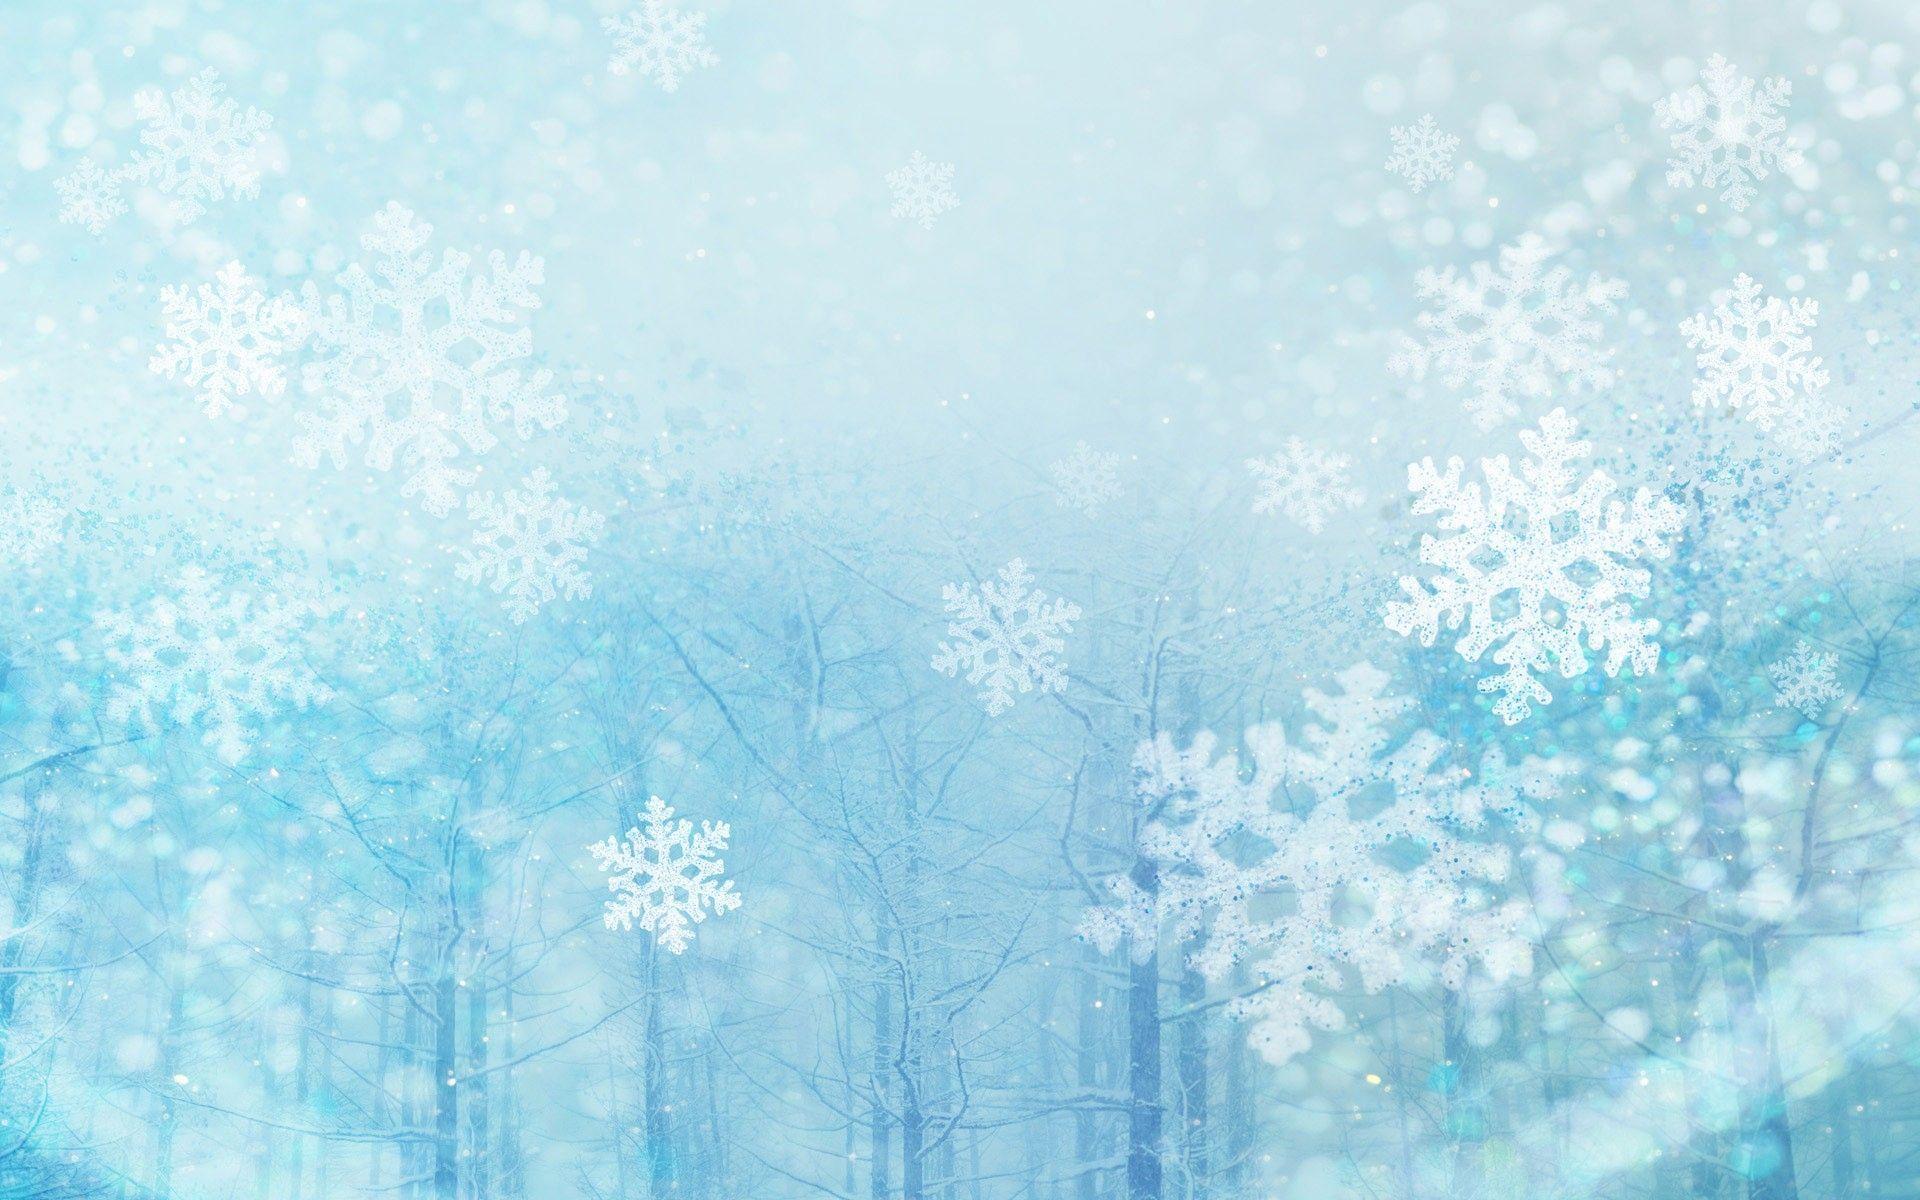 snowflake wallpaper iphone - photo #22